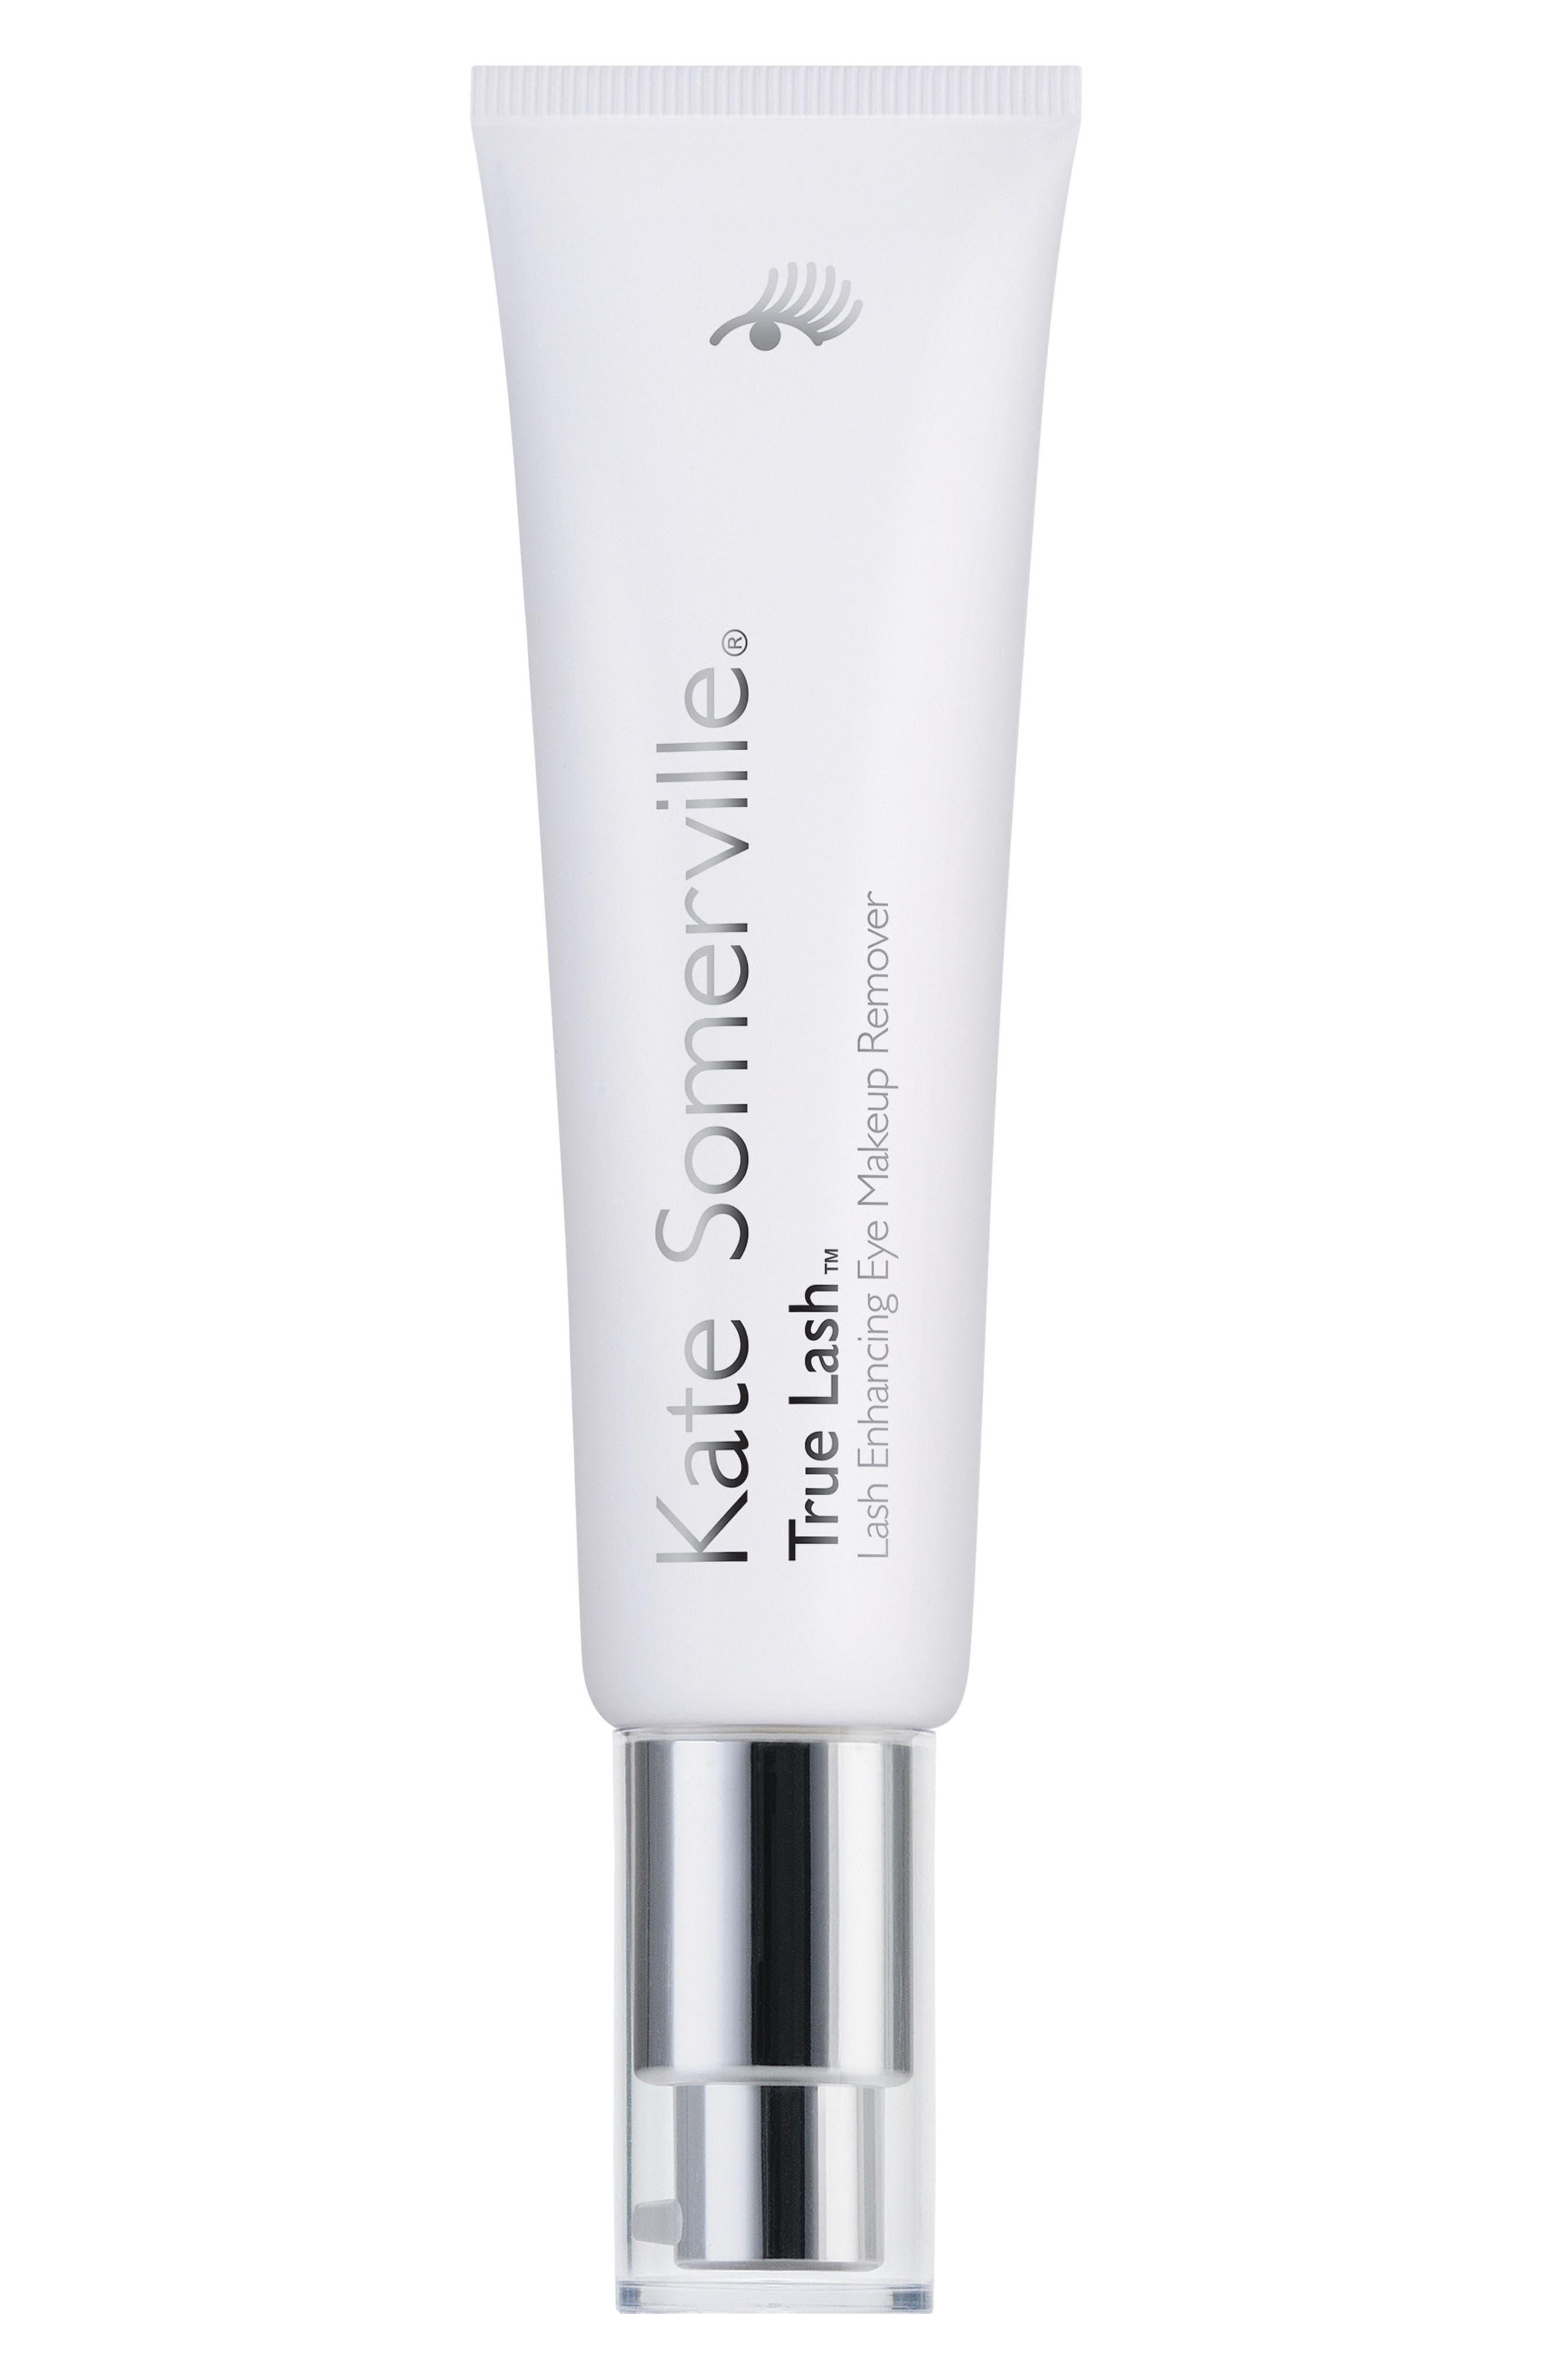 'True Lash<sup>™</sup>' Lash Enhancing Eye Makeup Remover,                             Main thumbnail 1, color,                             000